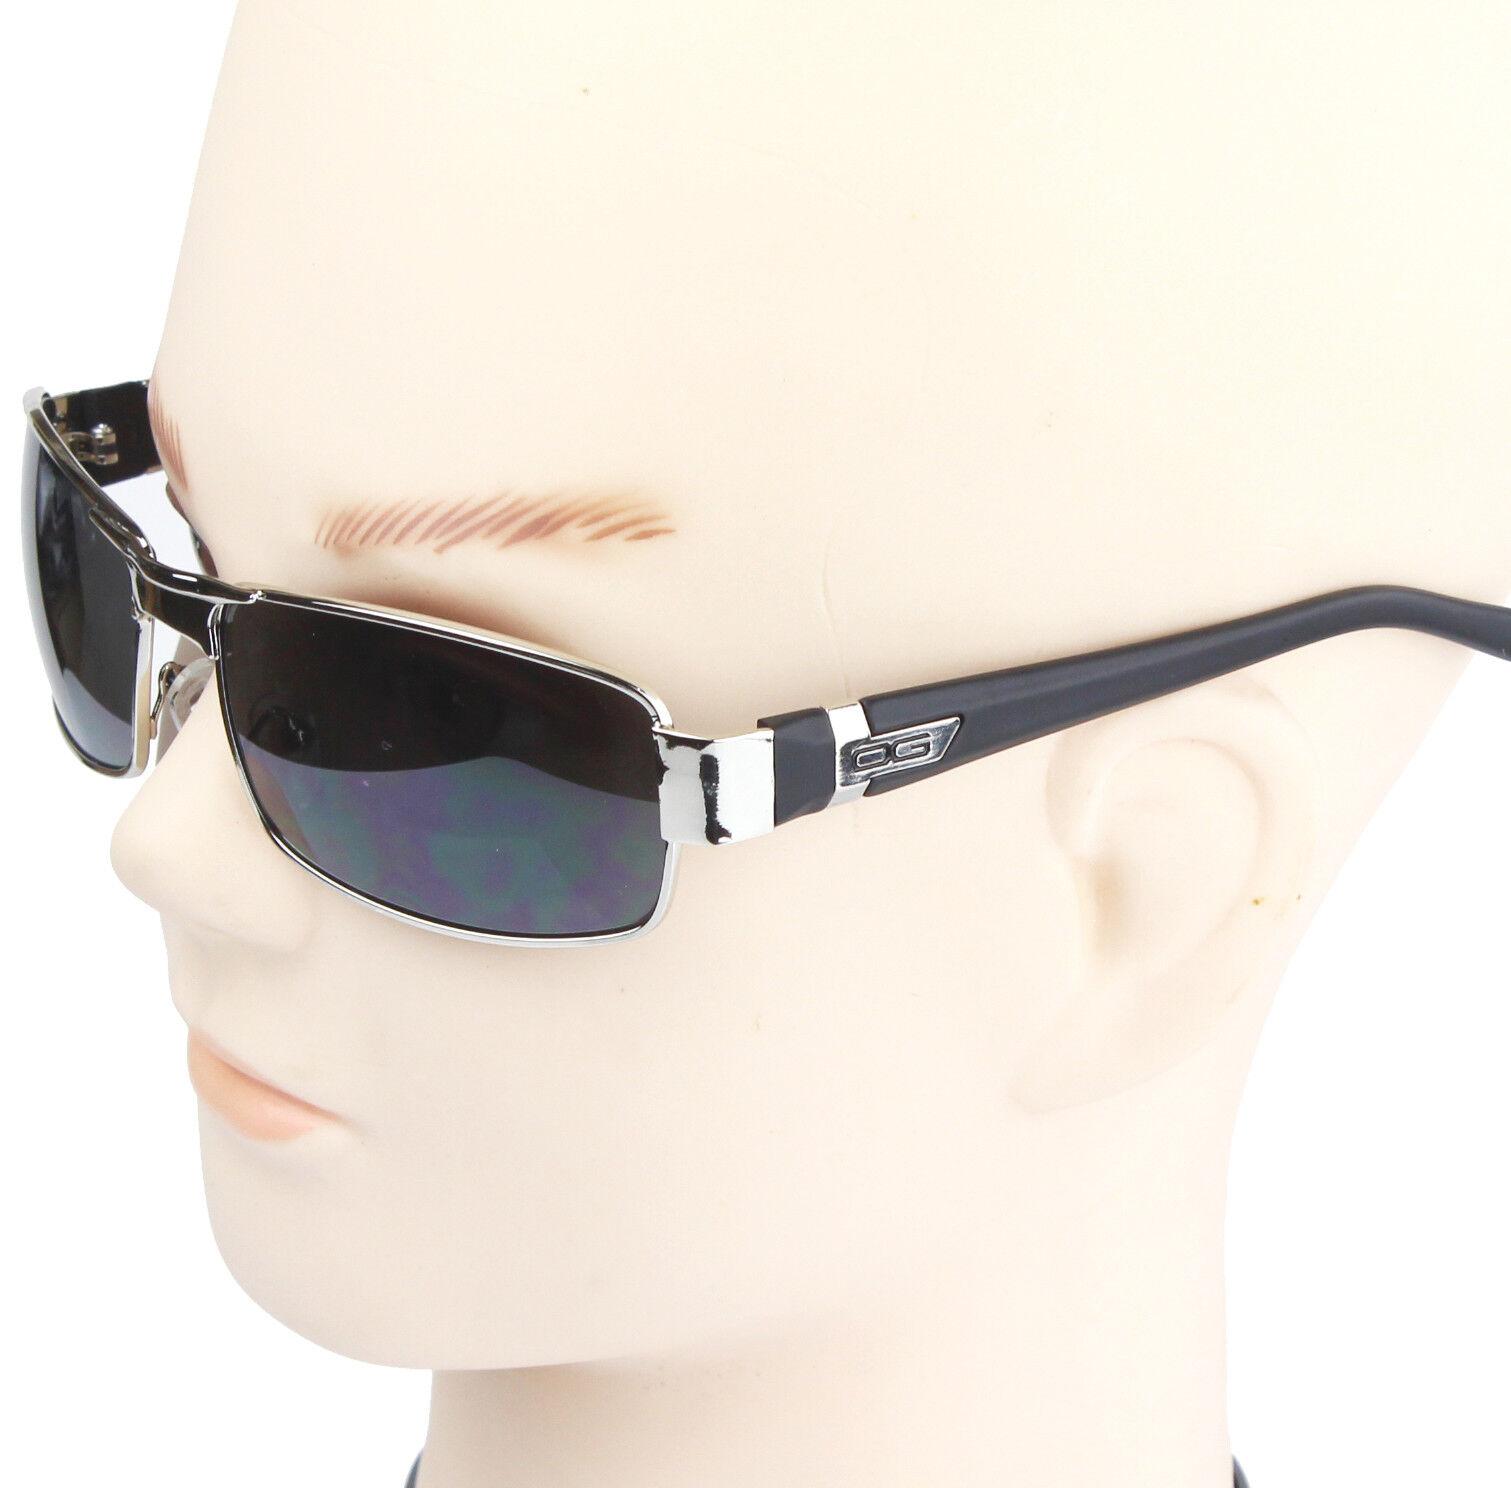 d5bd496361f7 Мужские солнцезащитные очки Mens DG Eyewear Wrap Around Sunglasses Fashion  Designer Rectangular Retro Shades